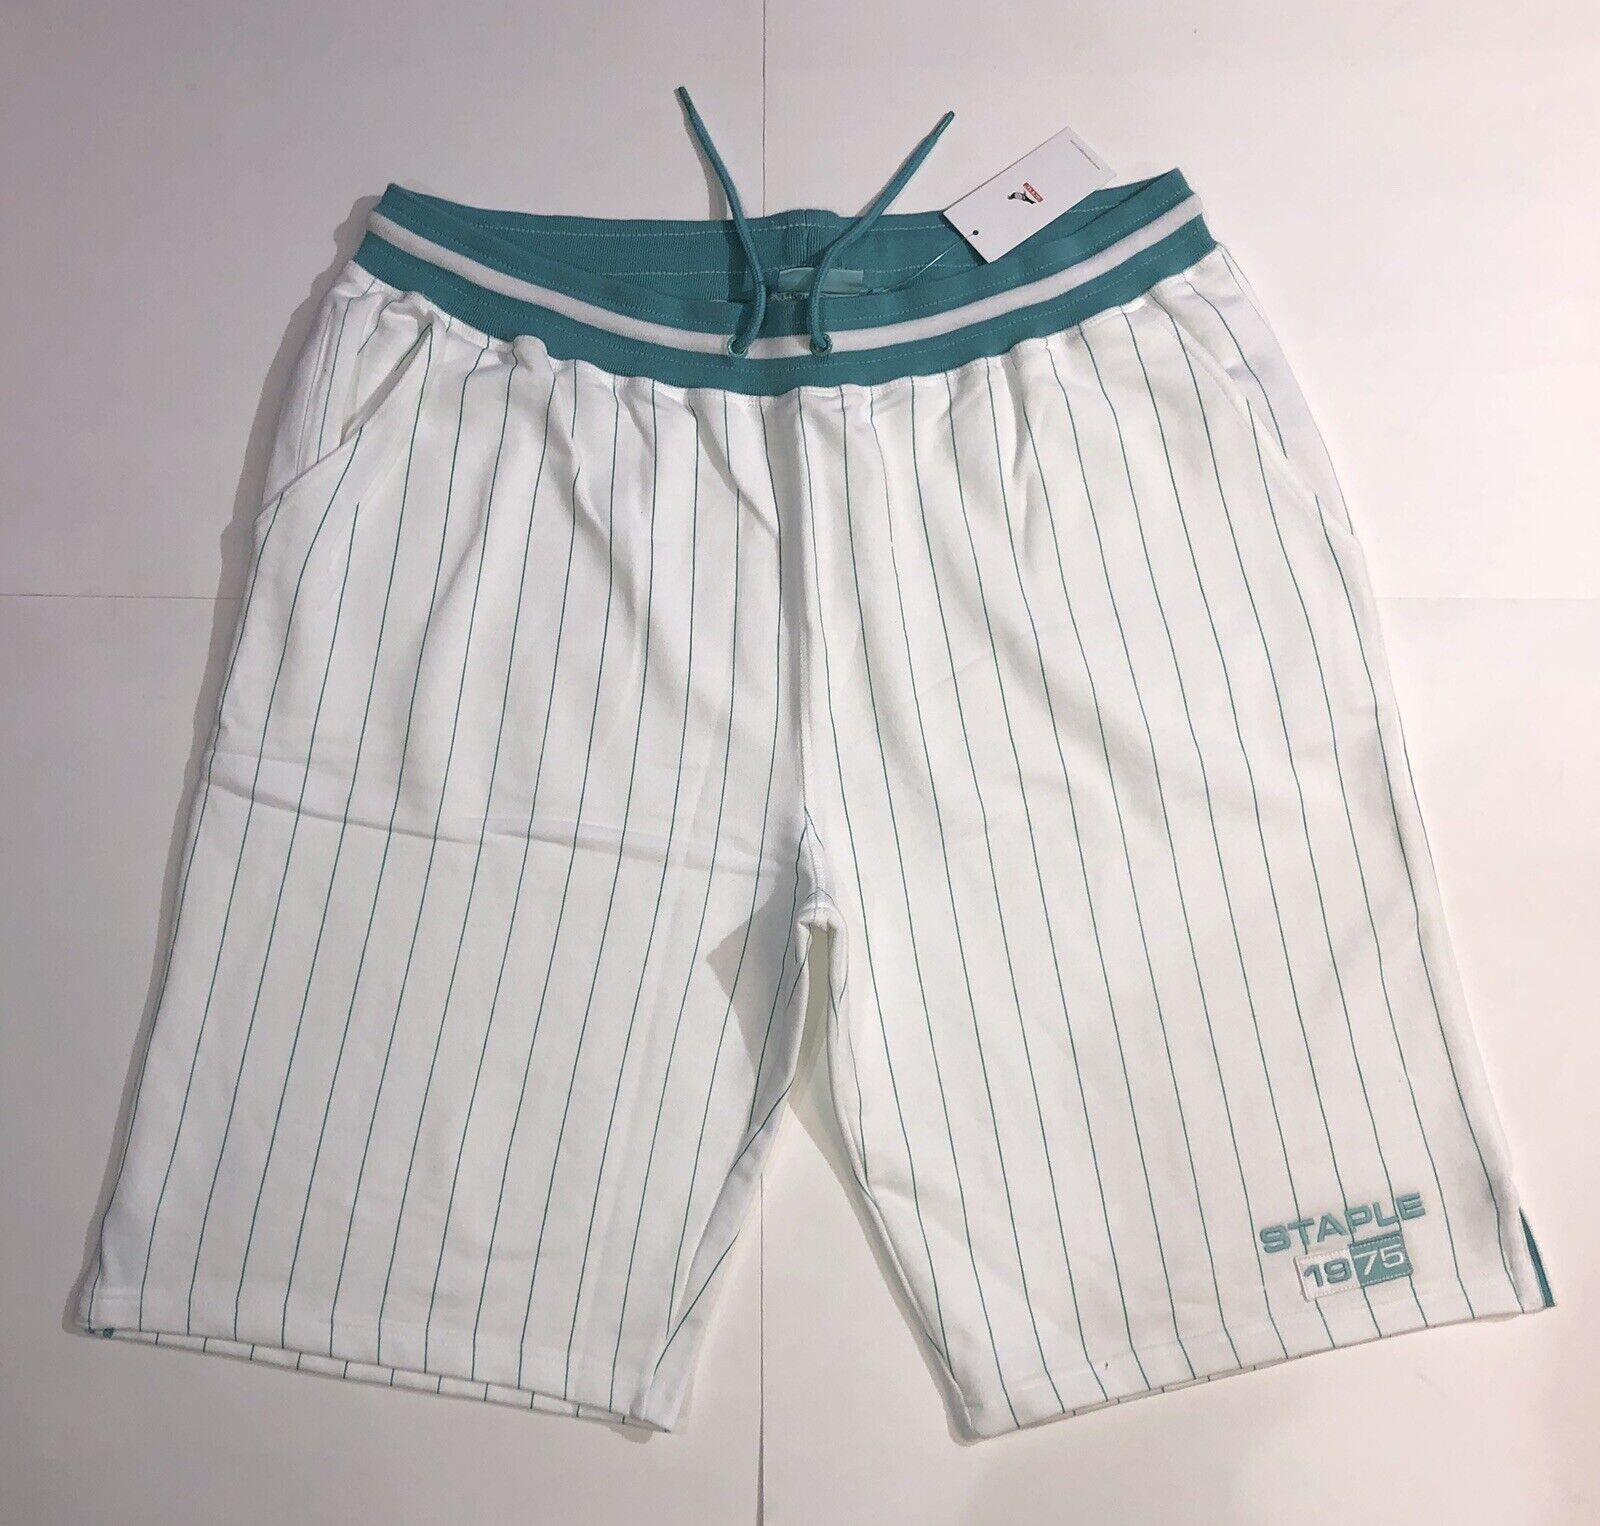 Staple Sweat-Shorts Wht Sz. 3xl NWT Retail   100% Authentic